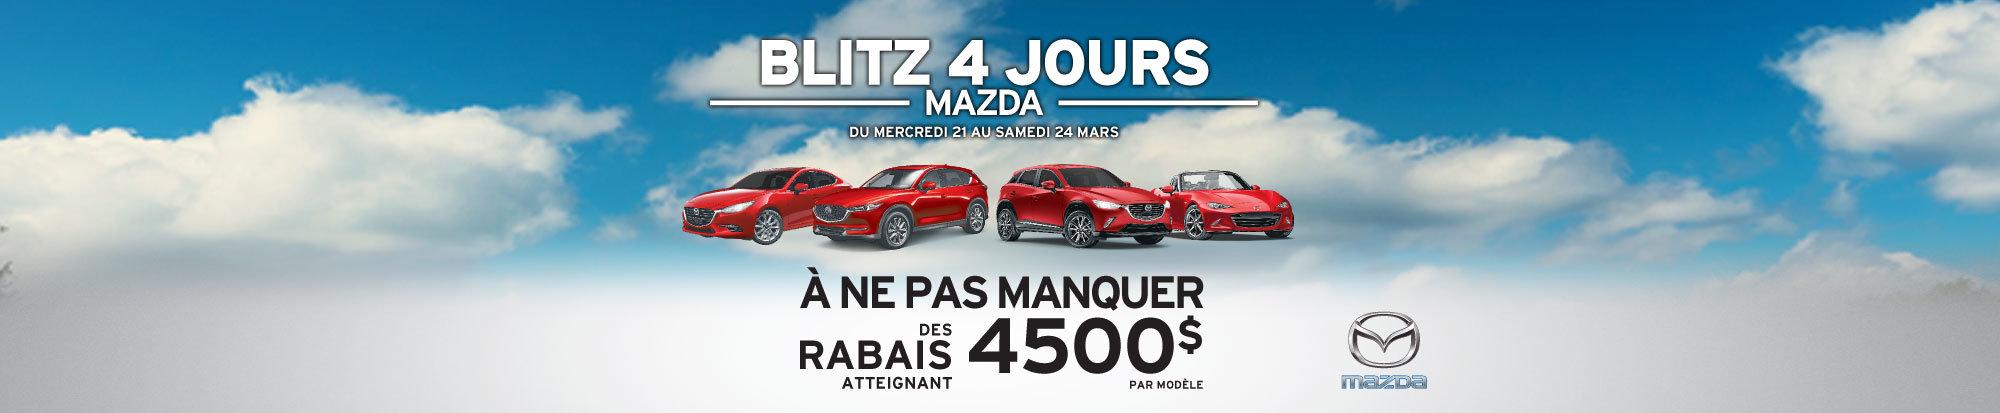 Blitz 4 jours Mazda - web